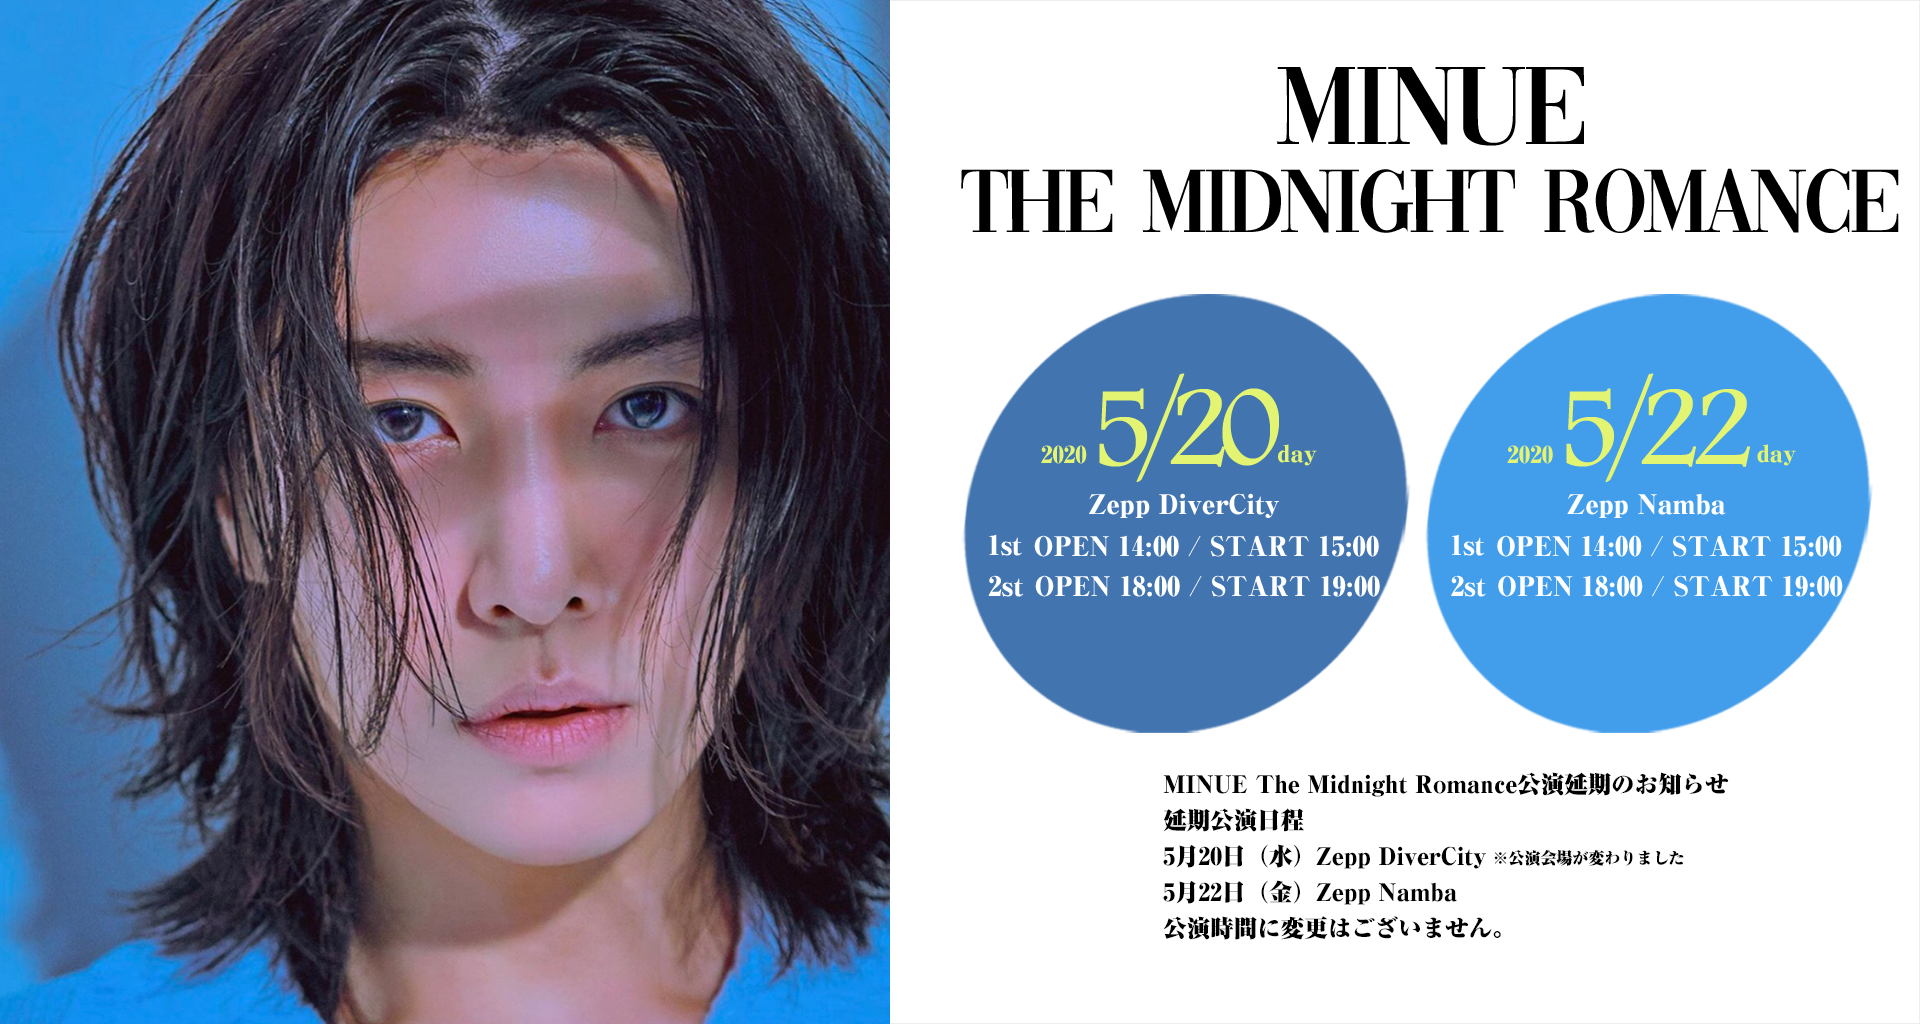 MINUE The Midnight Romance